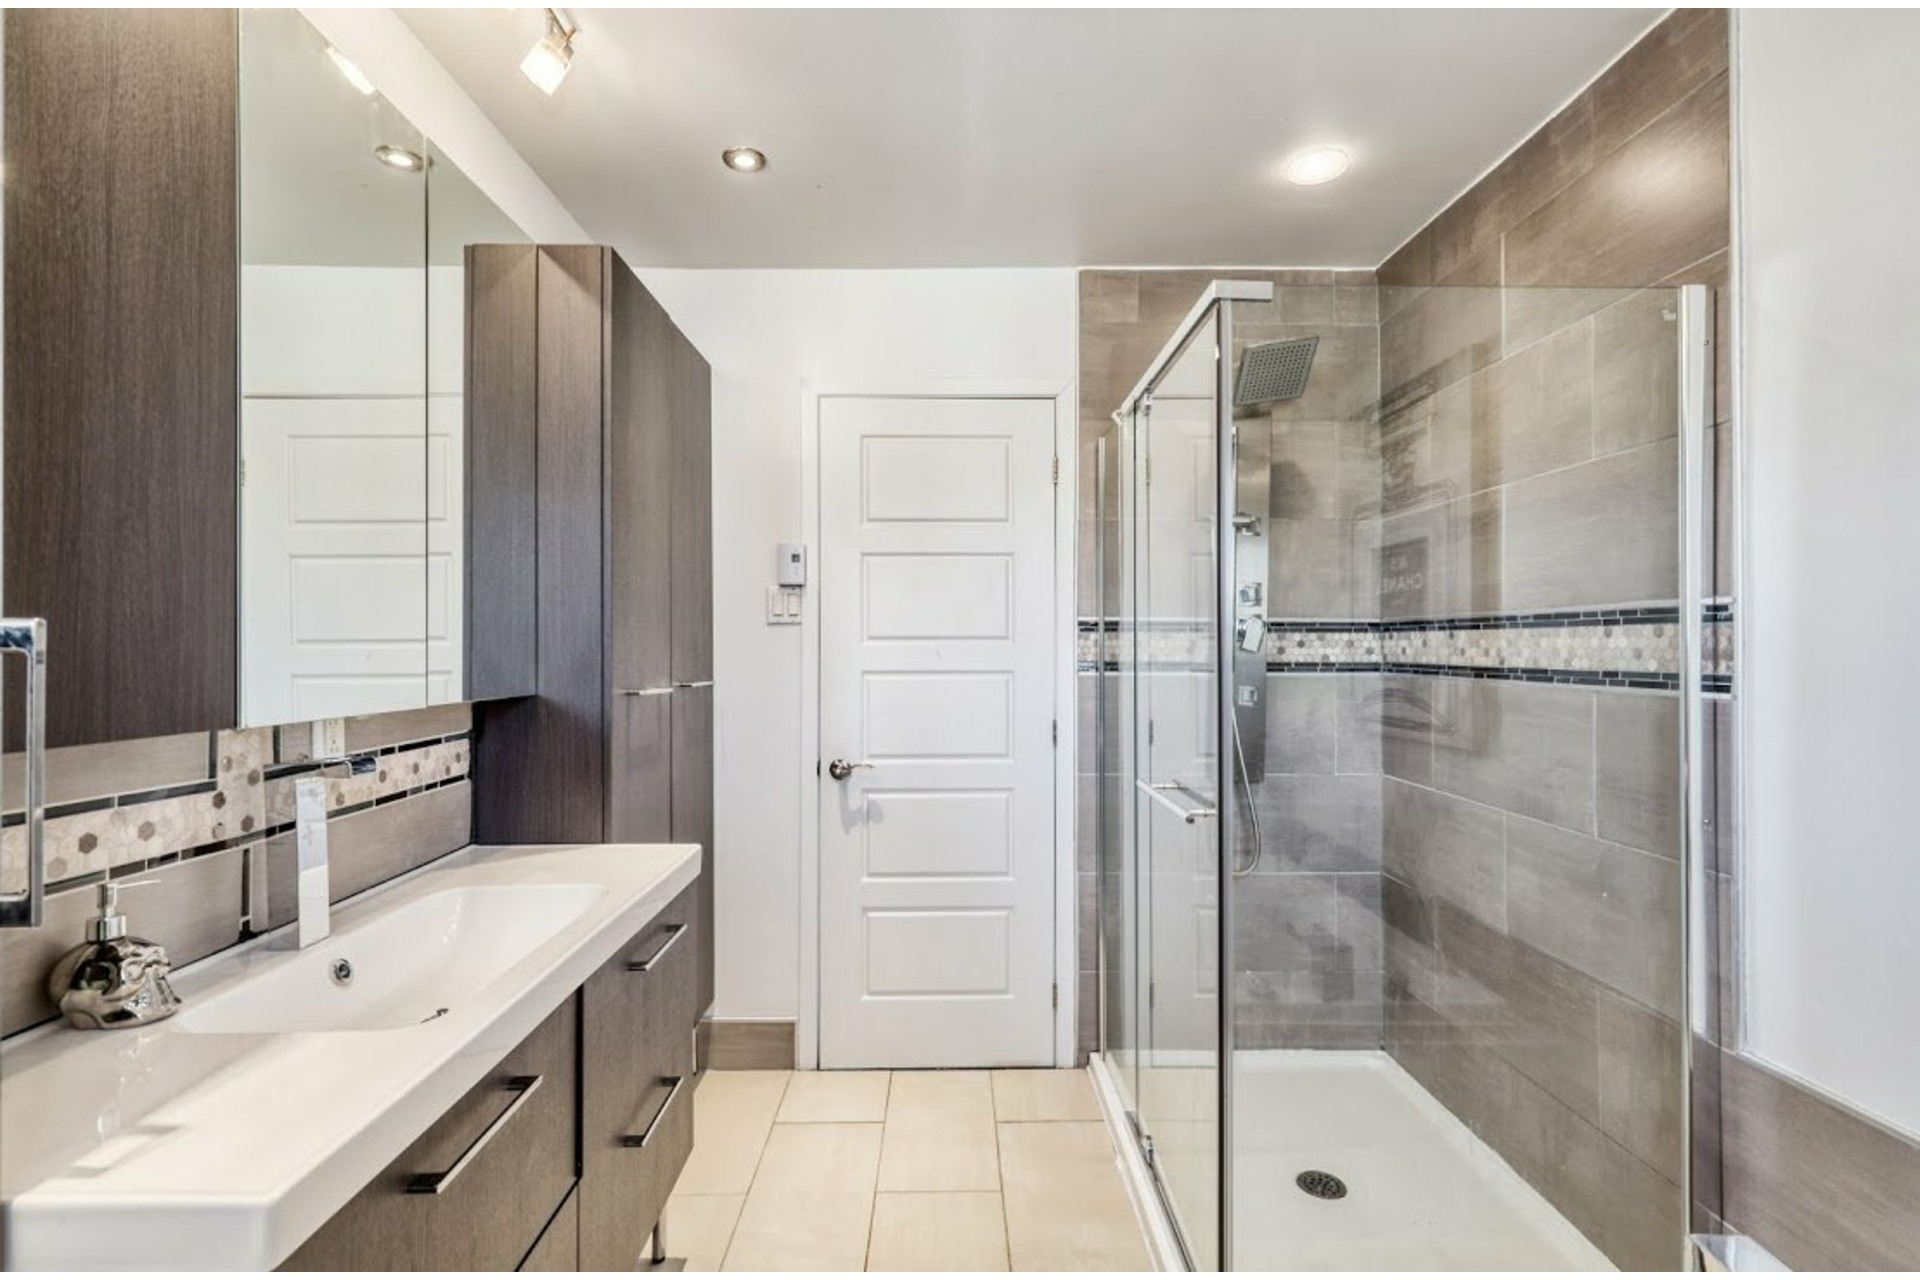 image 10 - House For sale Notre-Dame-des-Prairies - 11 rooms